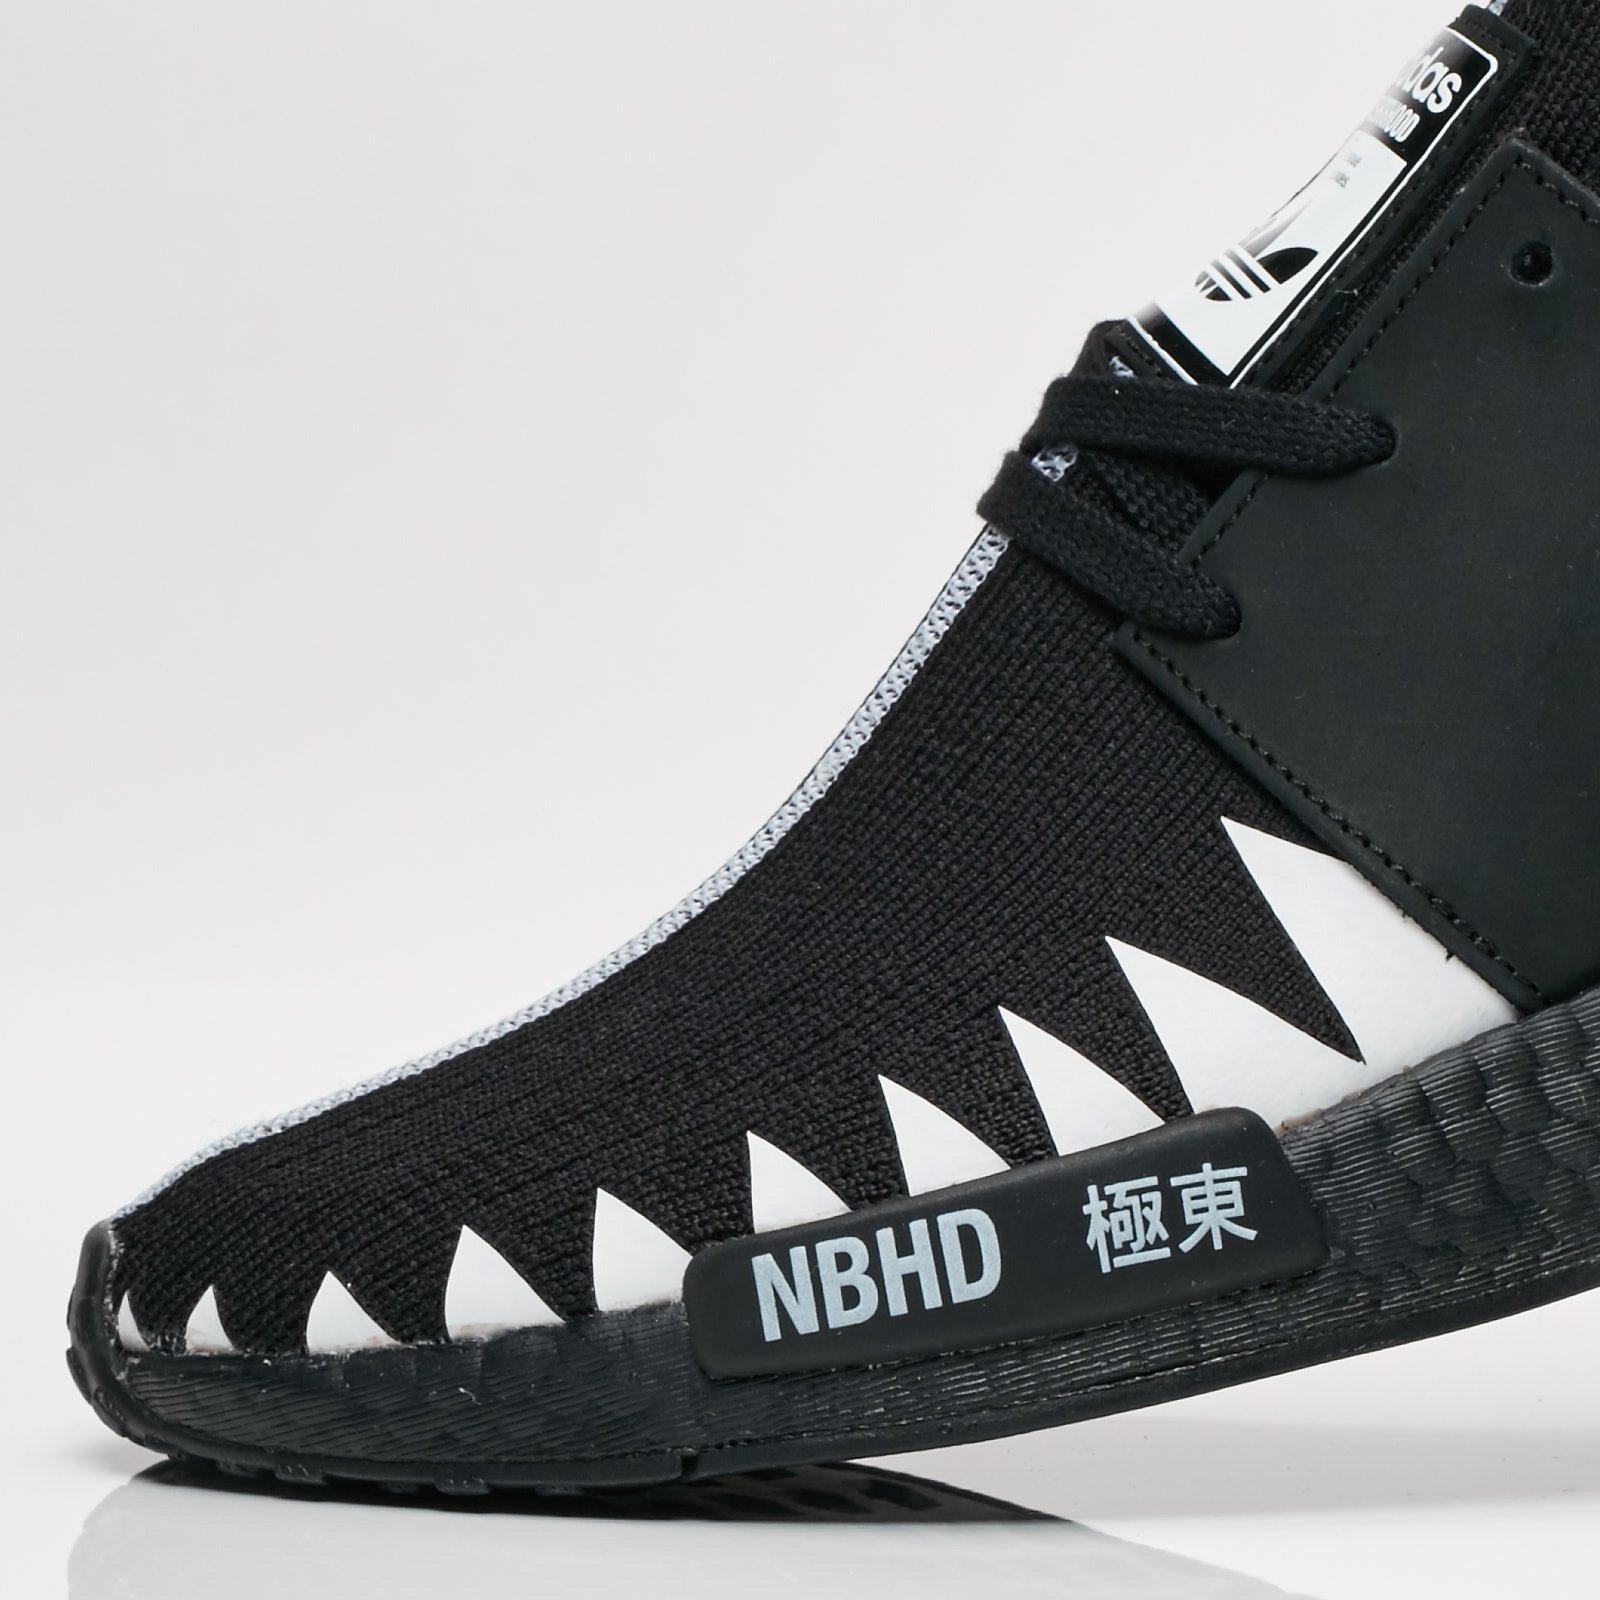 cheaper a38fc dc3b0 ... adidas Originals NMD R1 PK x Neighborhood ...